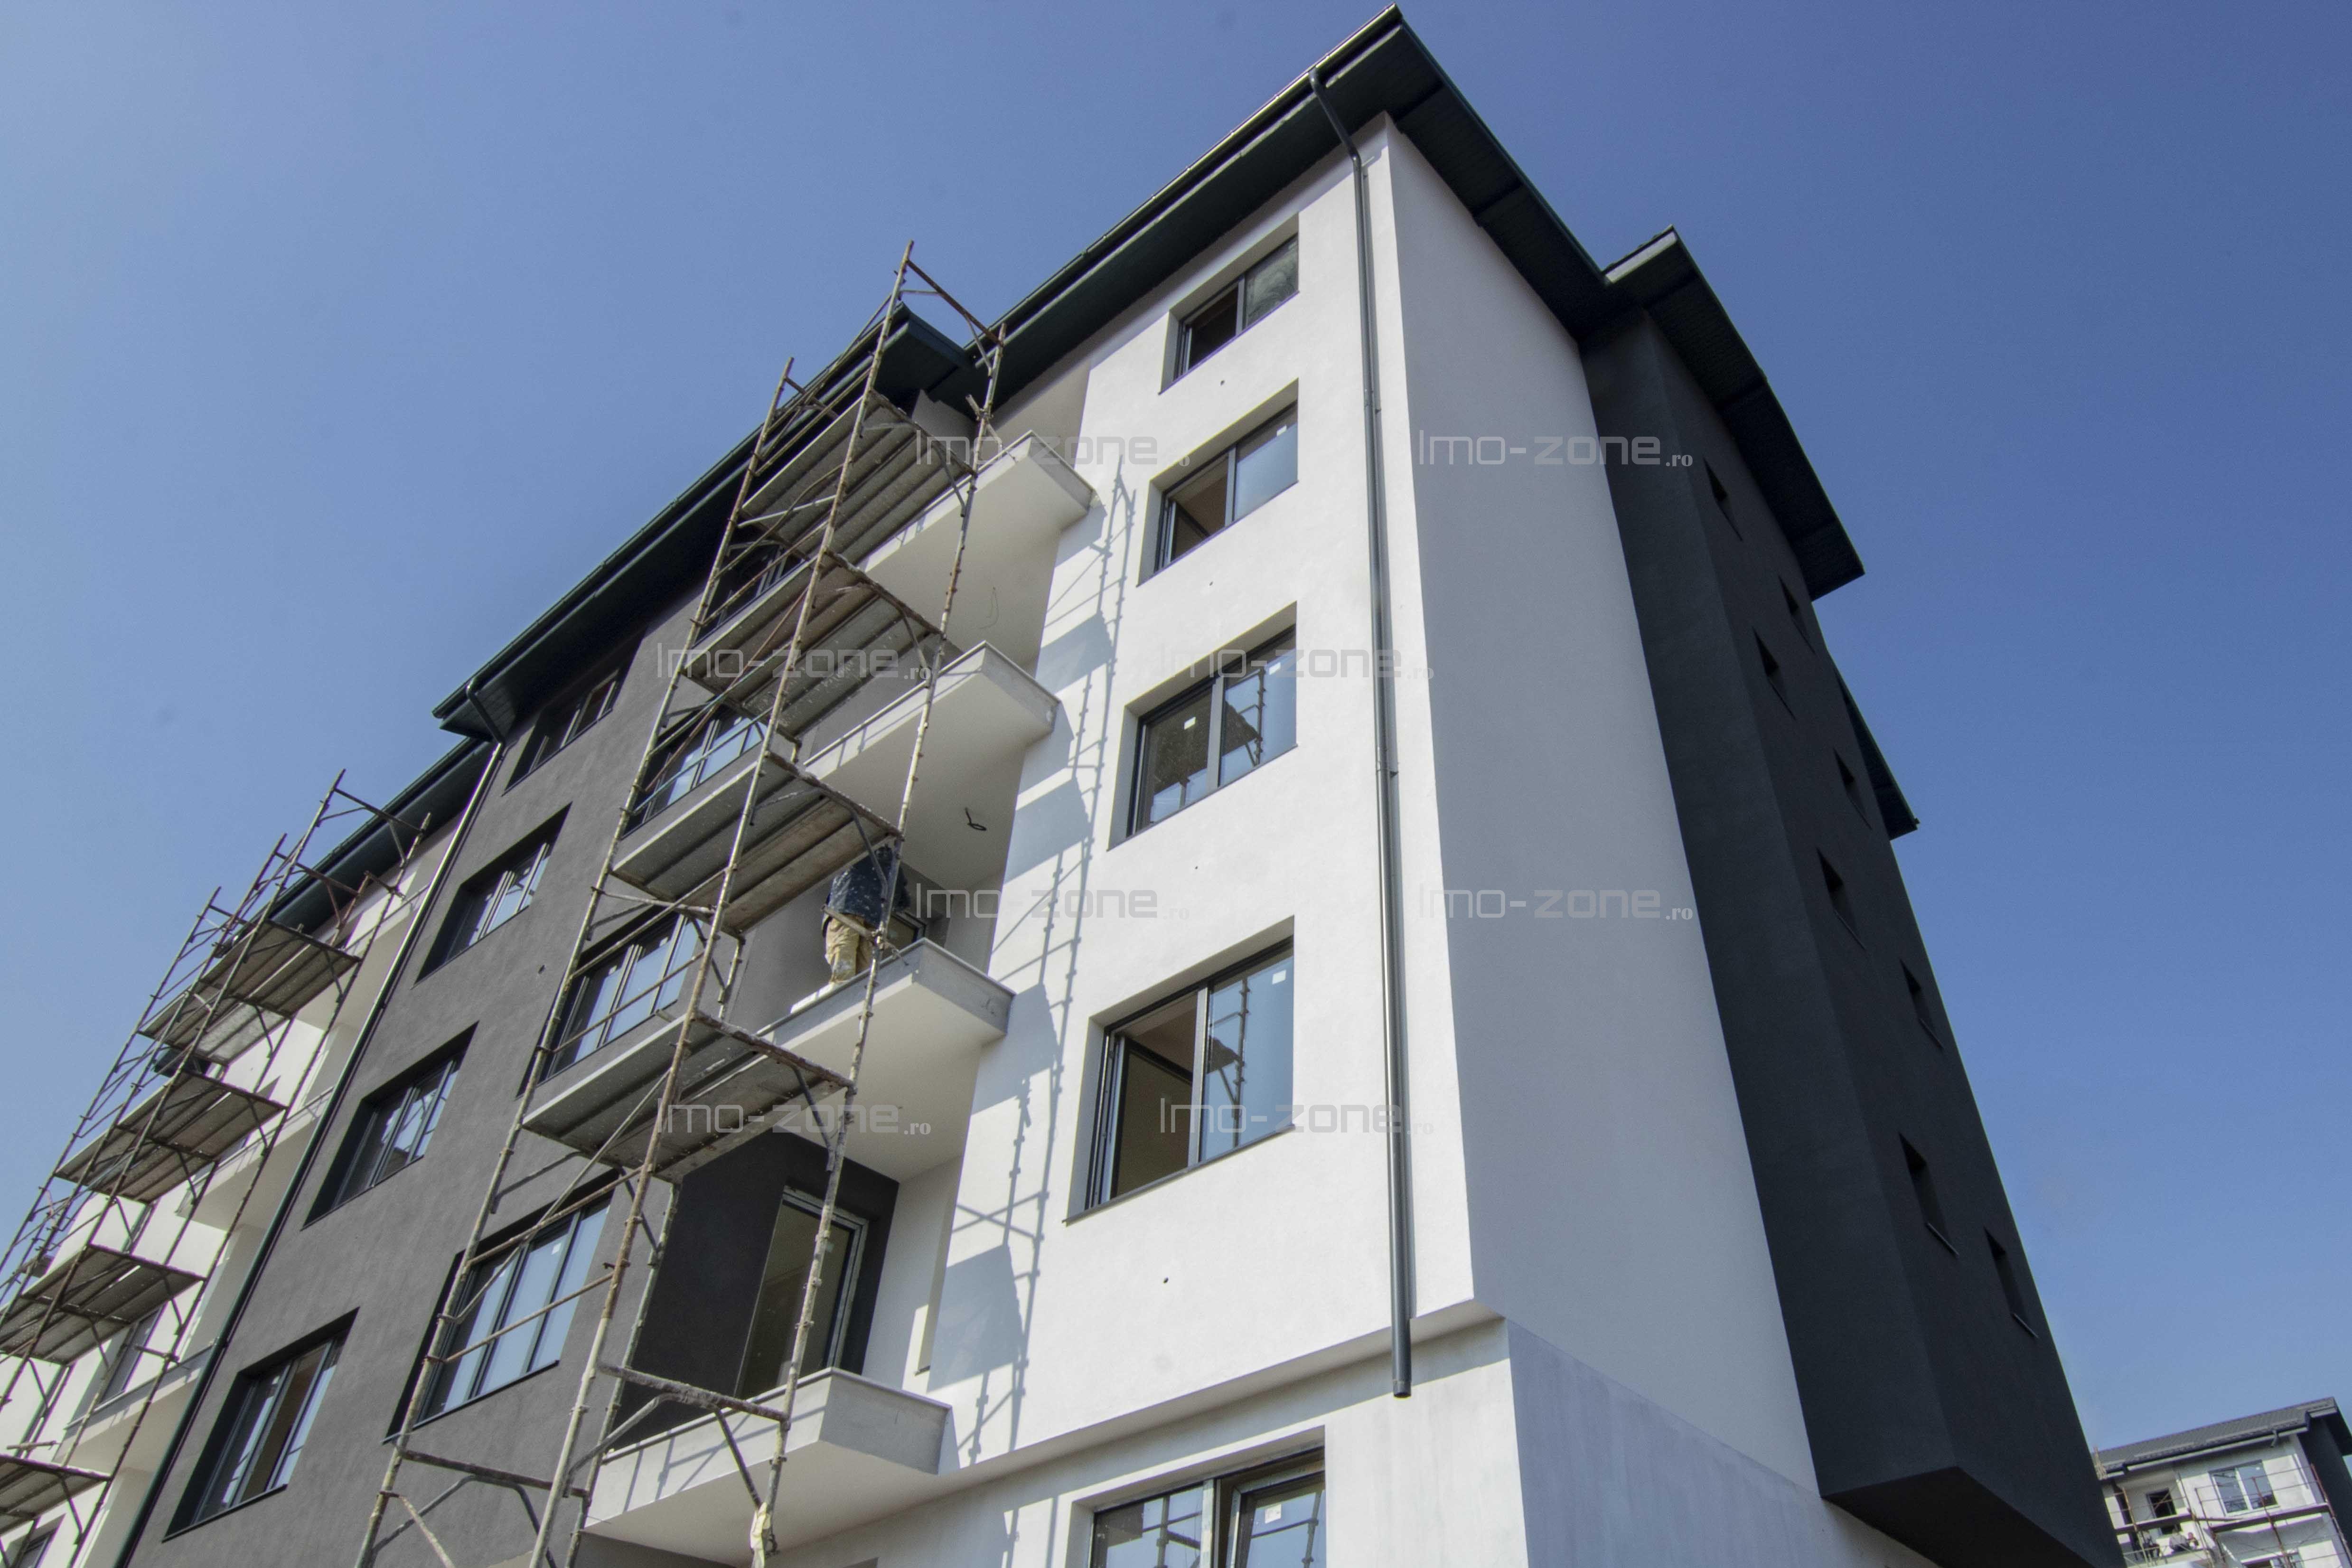 Apartament nou langa ANL Brancusi, predat la cheie, 56 mp, comision 0%